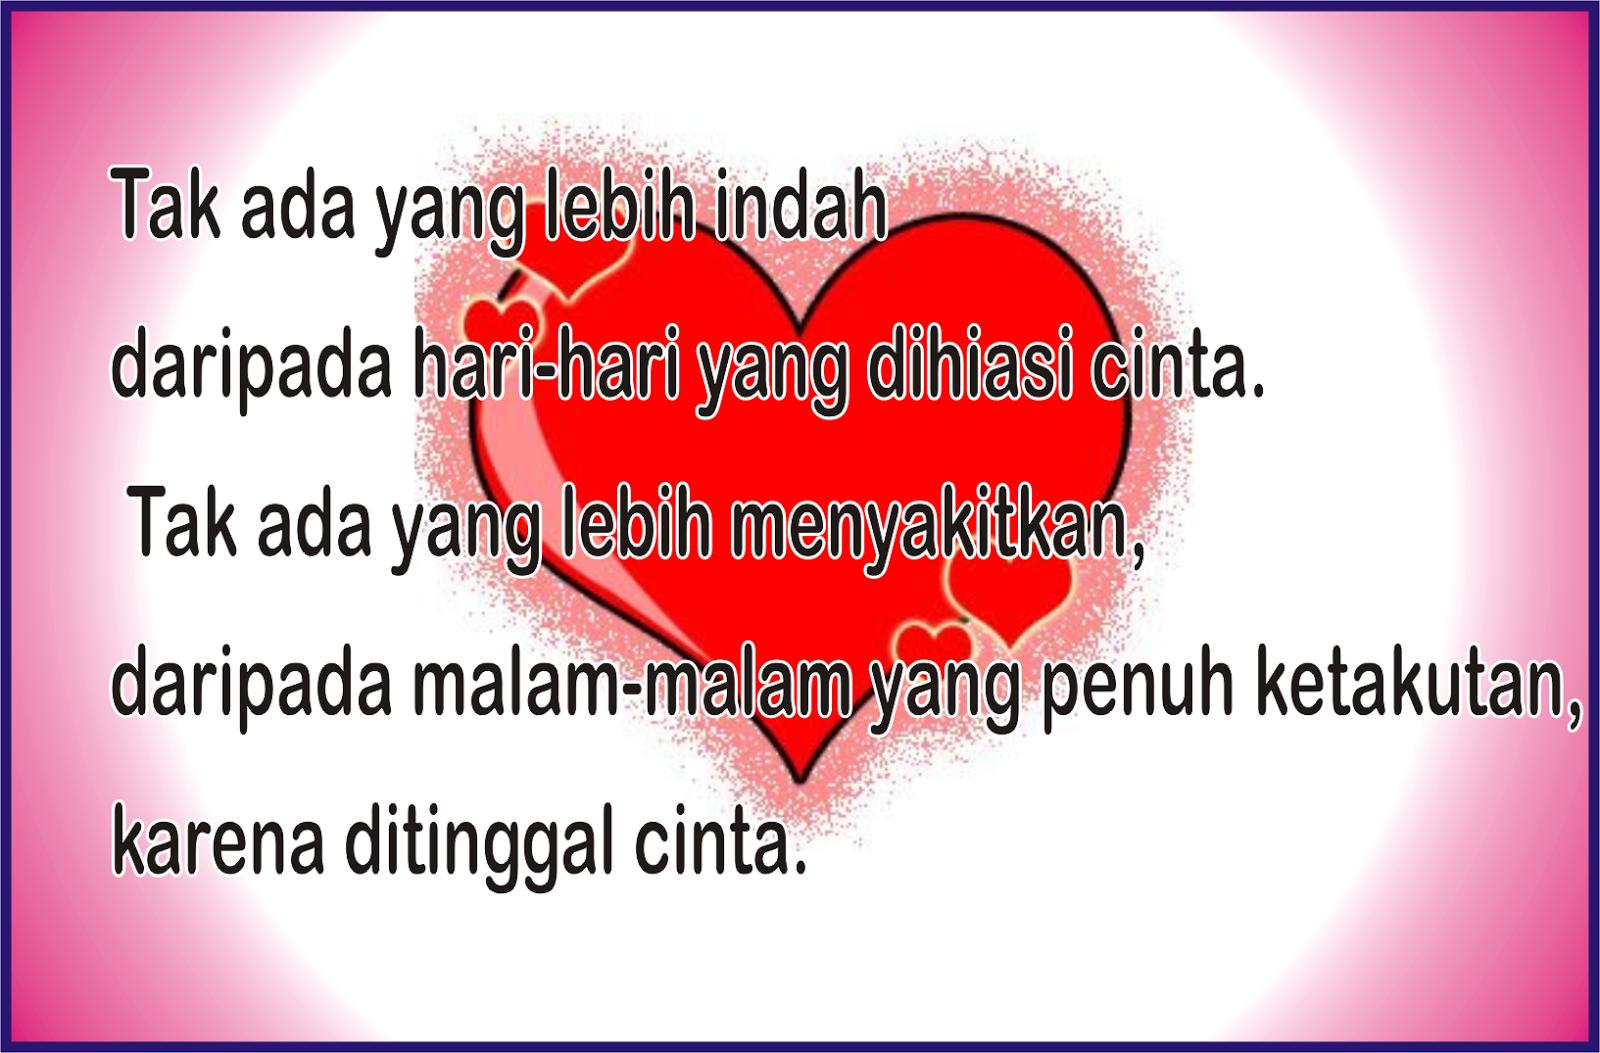 Cinta Dan Wanita Kata Kata Cinta Kumpulan Kata Cinta Romantis